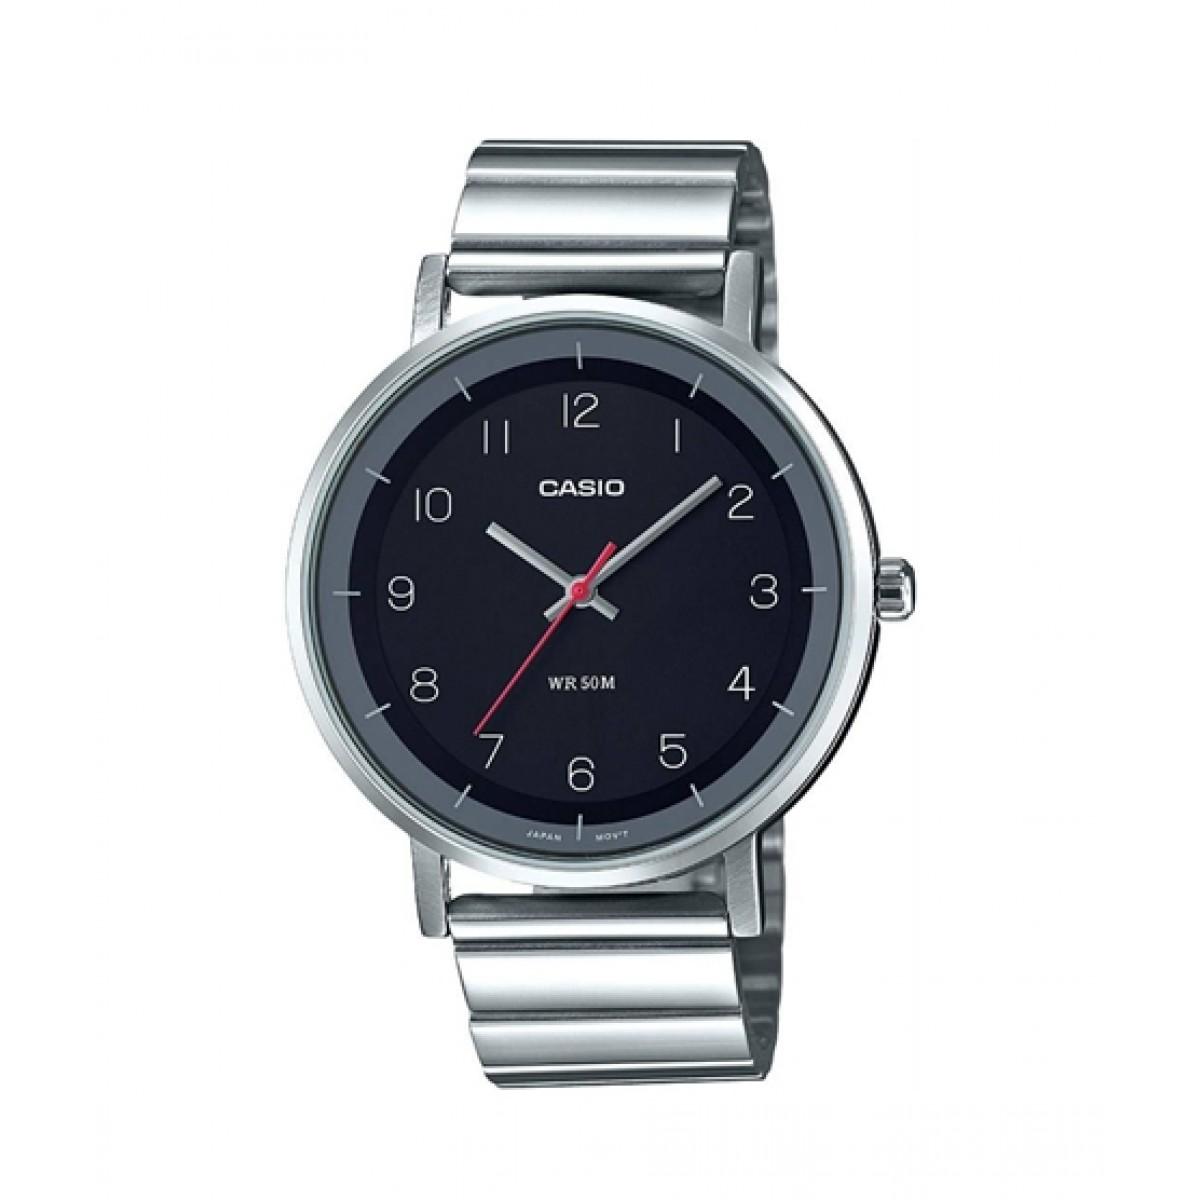 Casio Enticer Men's Watch (MTP-E139D-1BVDF)